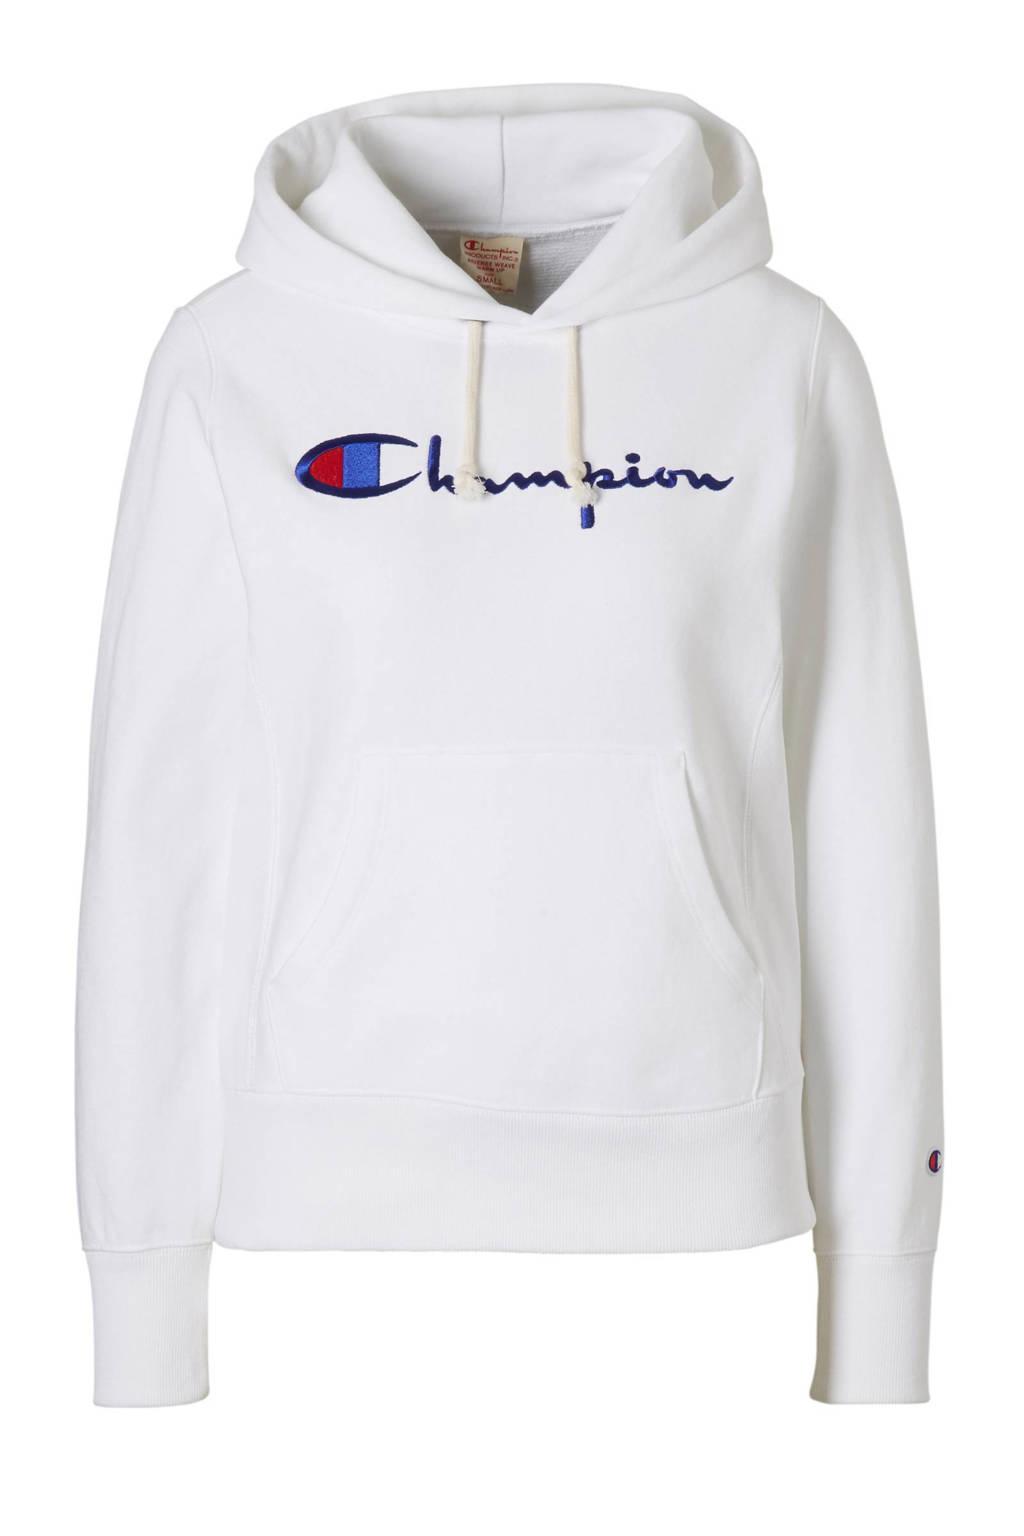 67b3bc97c7b1b5 Champion sweater